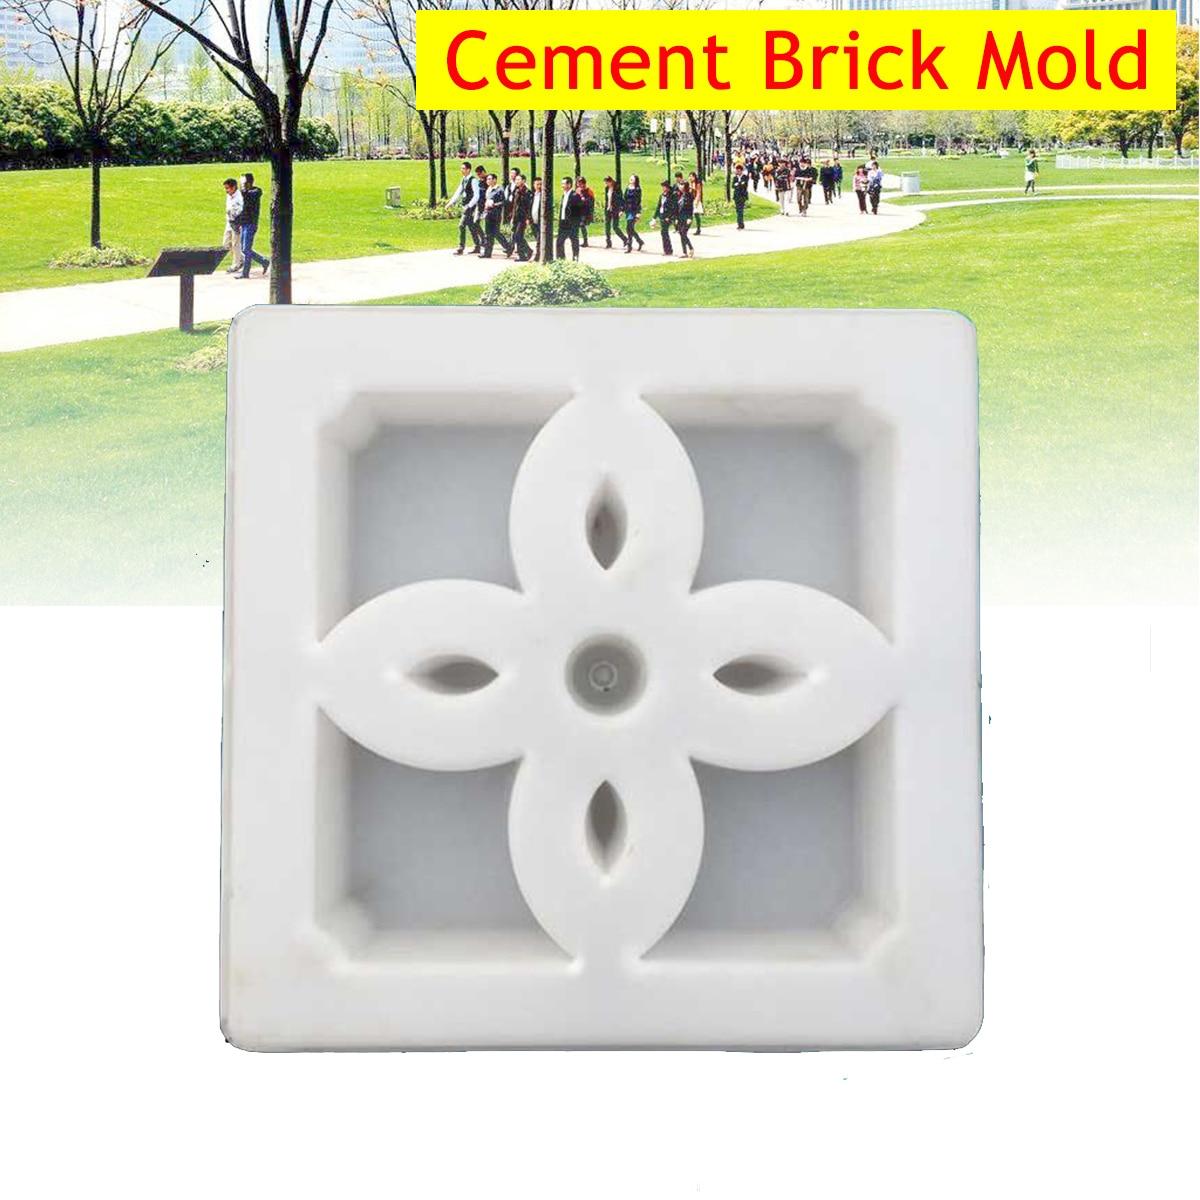 1 Stück 30*30 Cm Pathmate Stein Form Pflaster Beton Sprungbrett Form Pflaster Fertiger Garten Dekoration Beton Formen